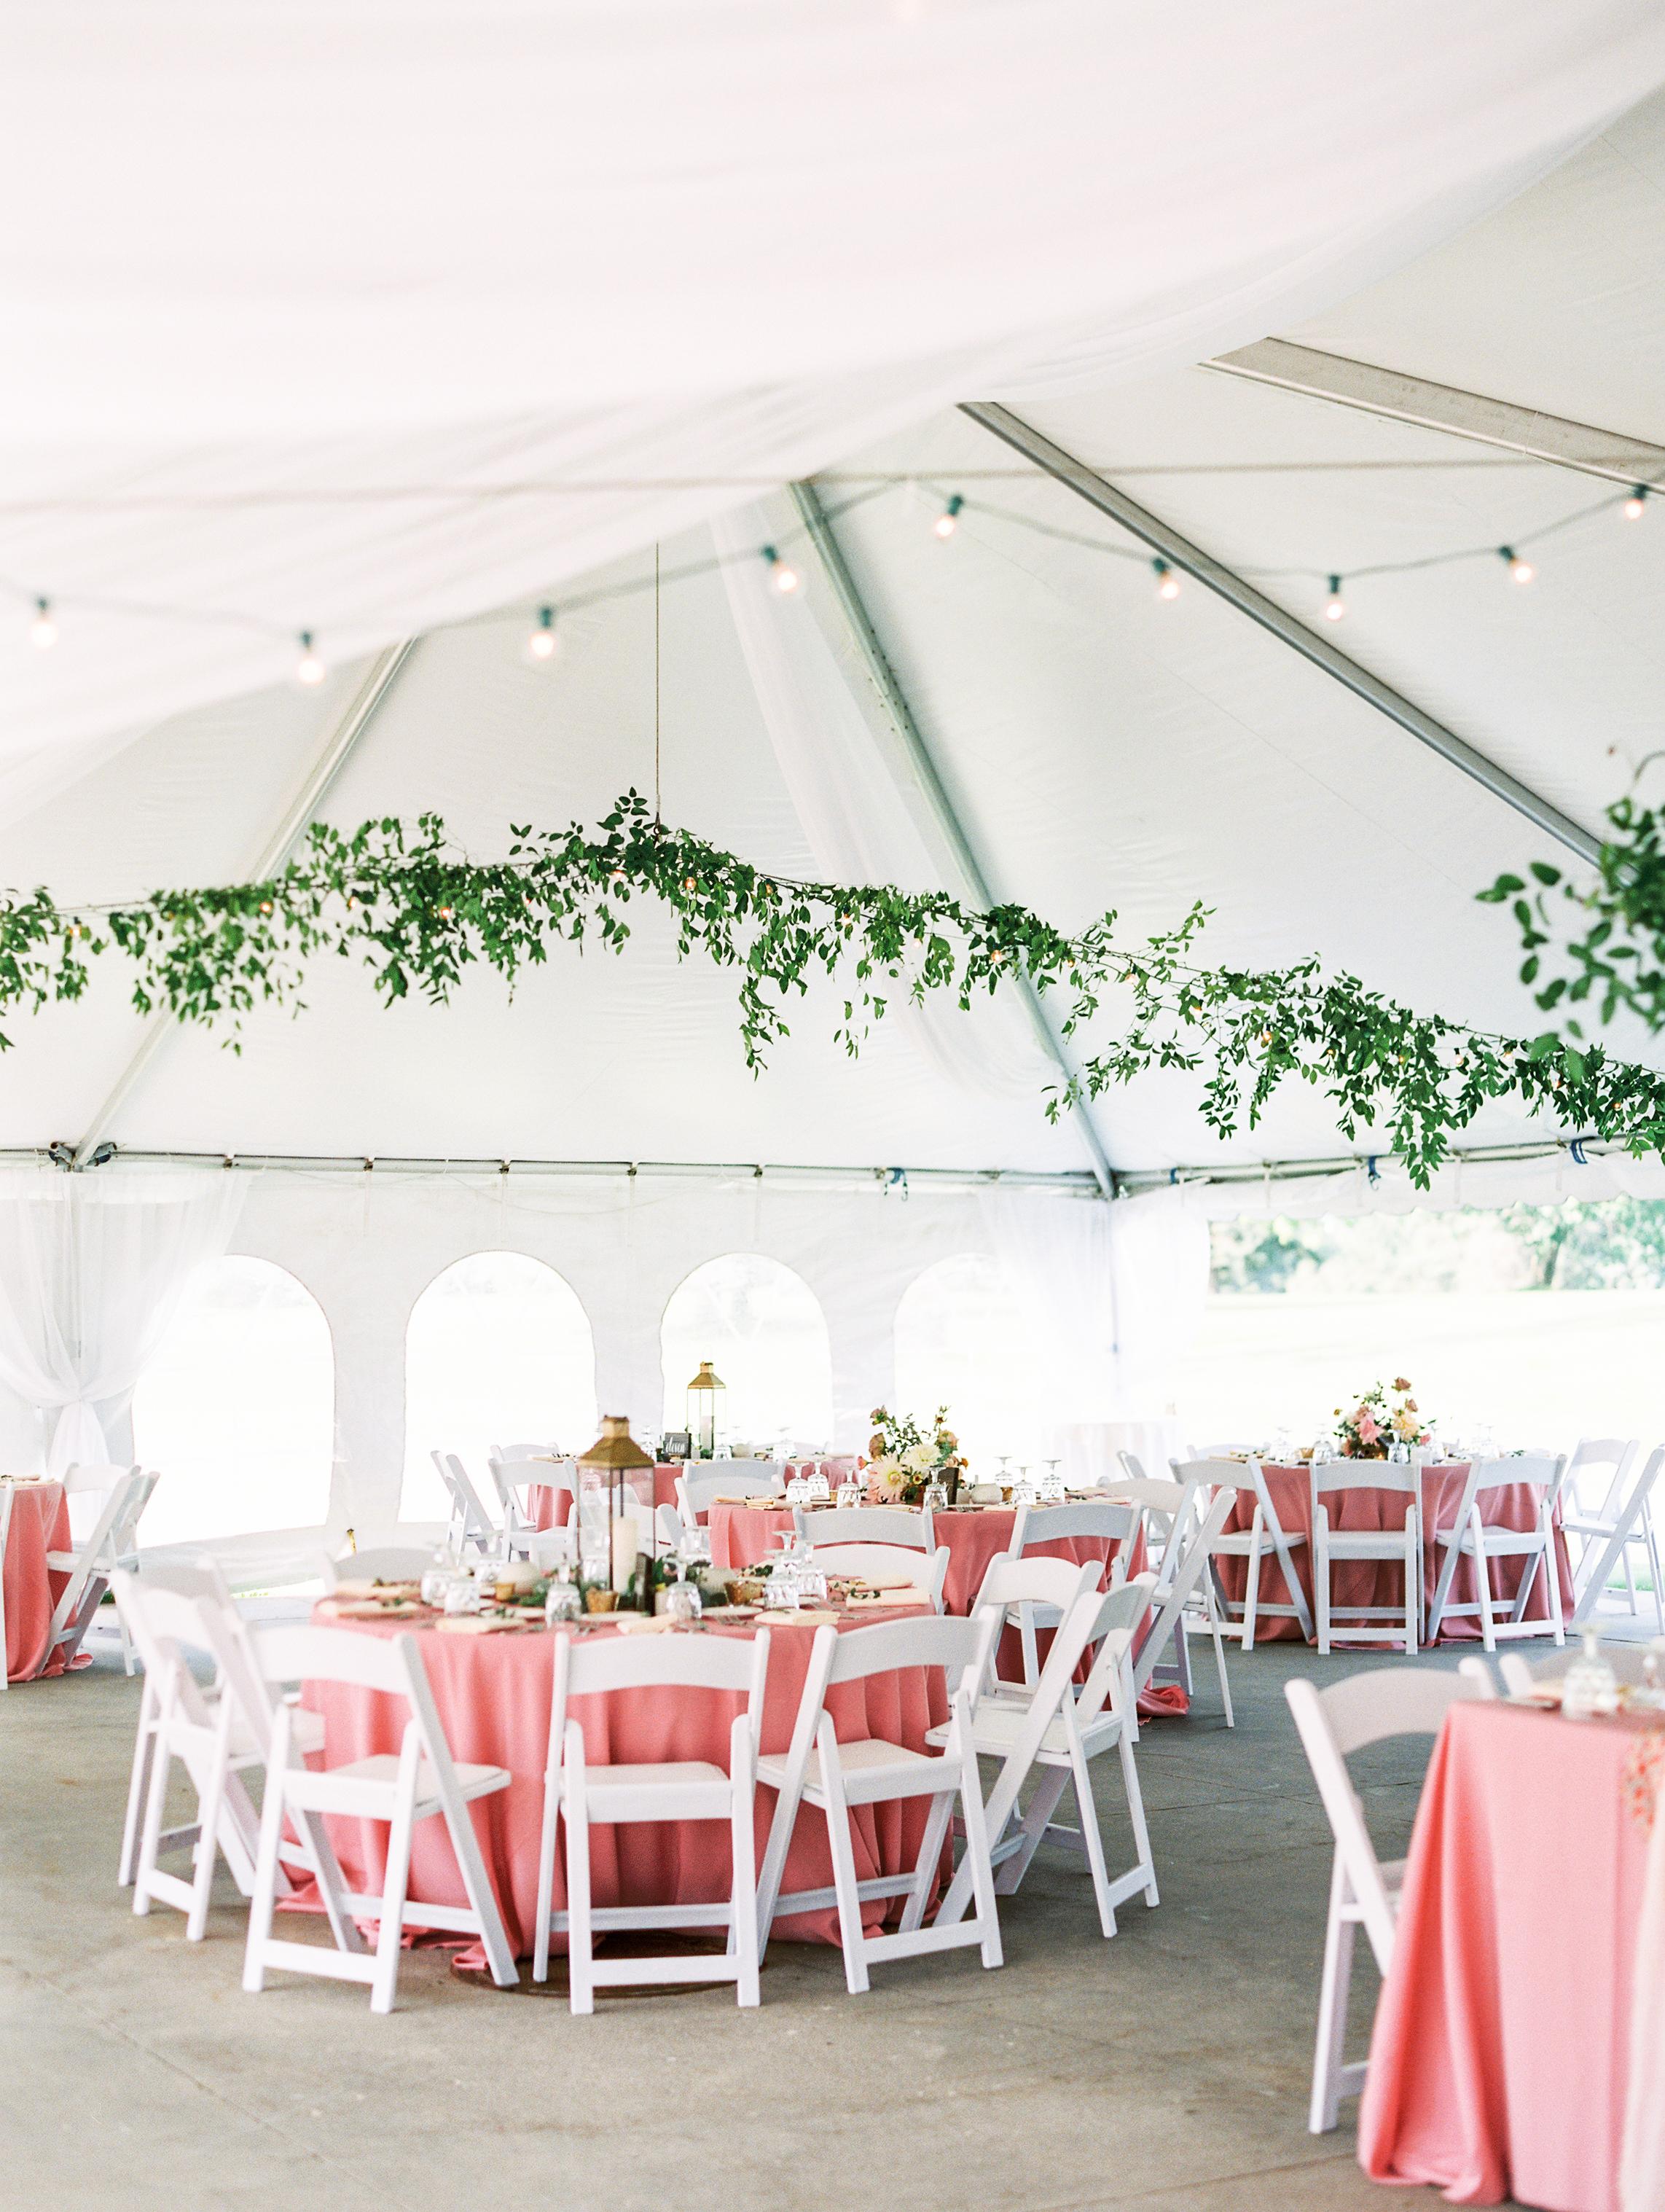 Zoller+Wedding+Reception+Detailsf-28.jpg